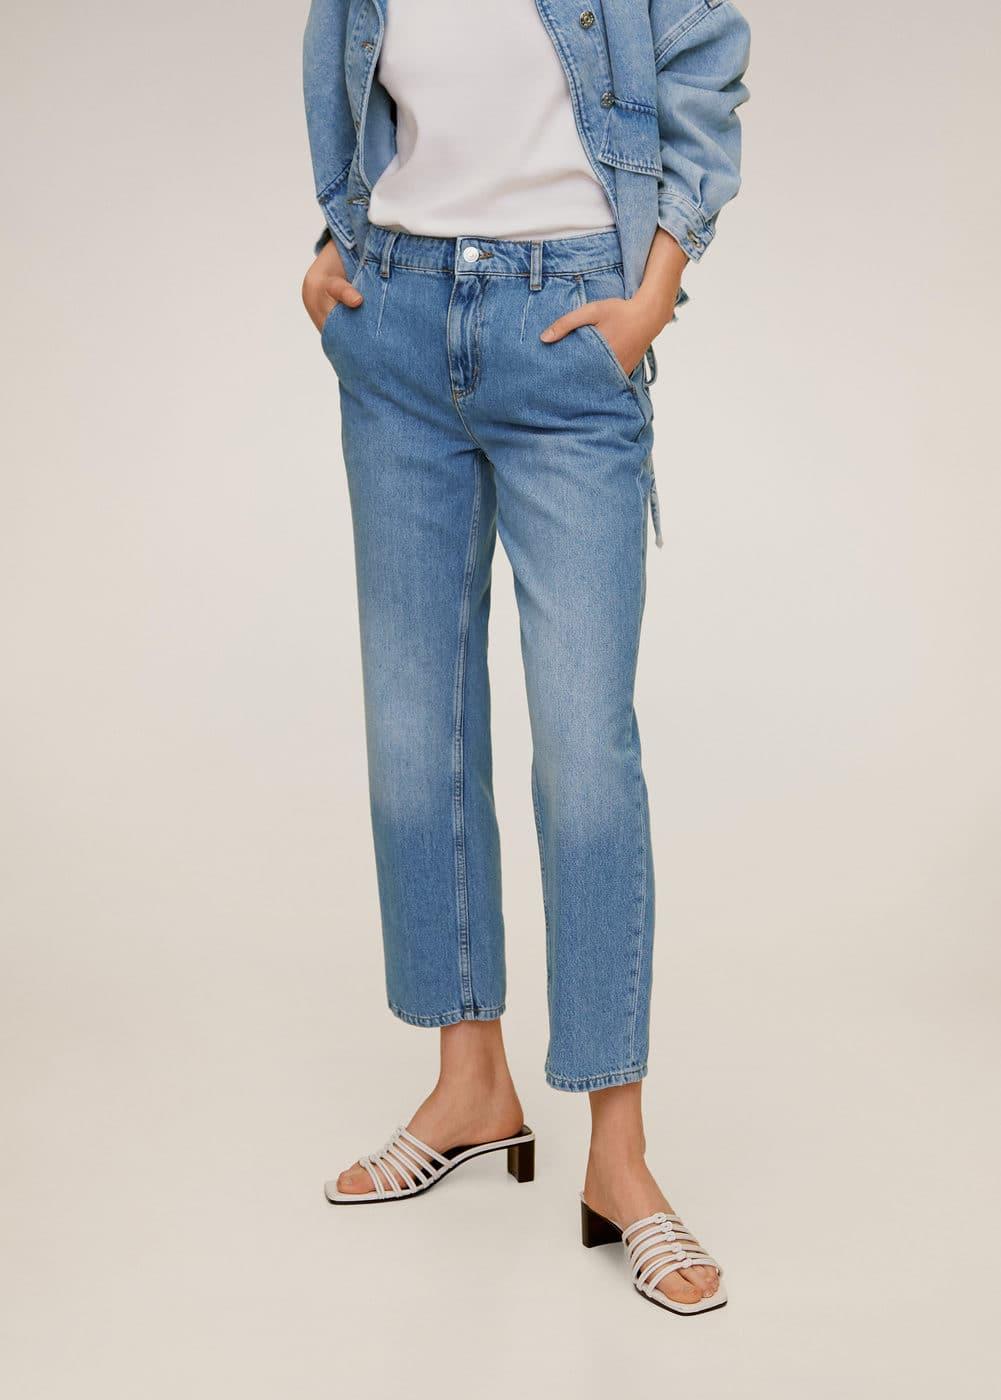 m-chino:jeans pinzas crop